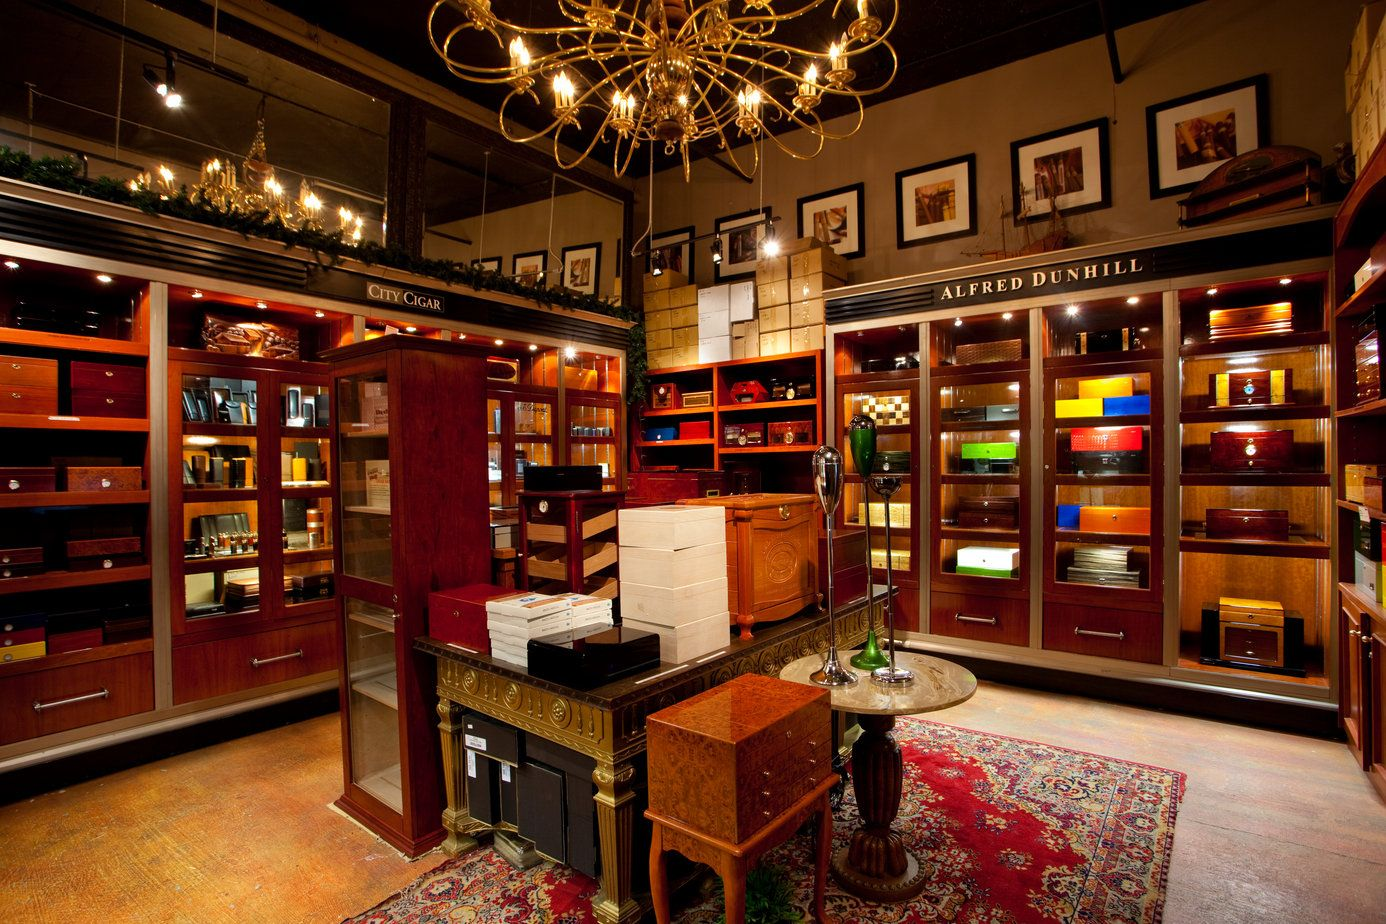 Cigar Store Liquor Display In 2018 Pinterest Cigars